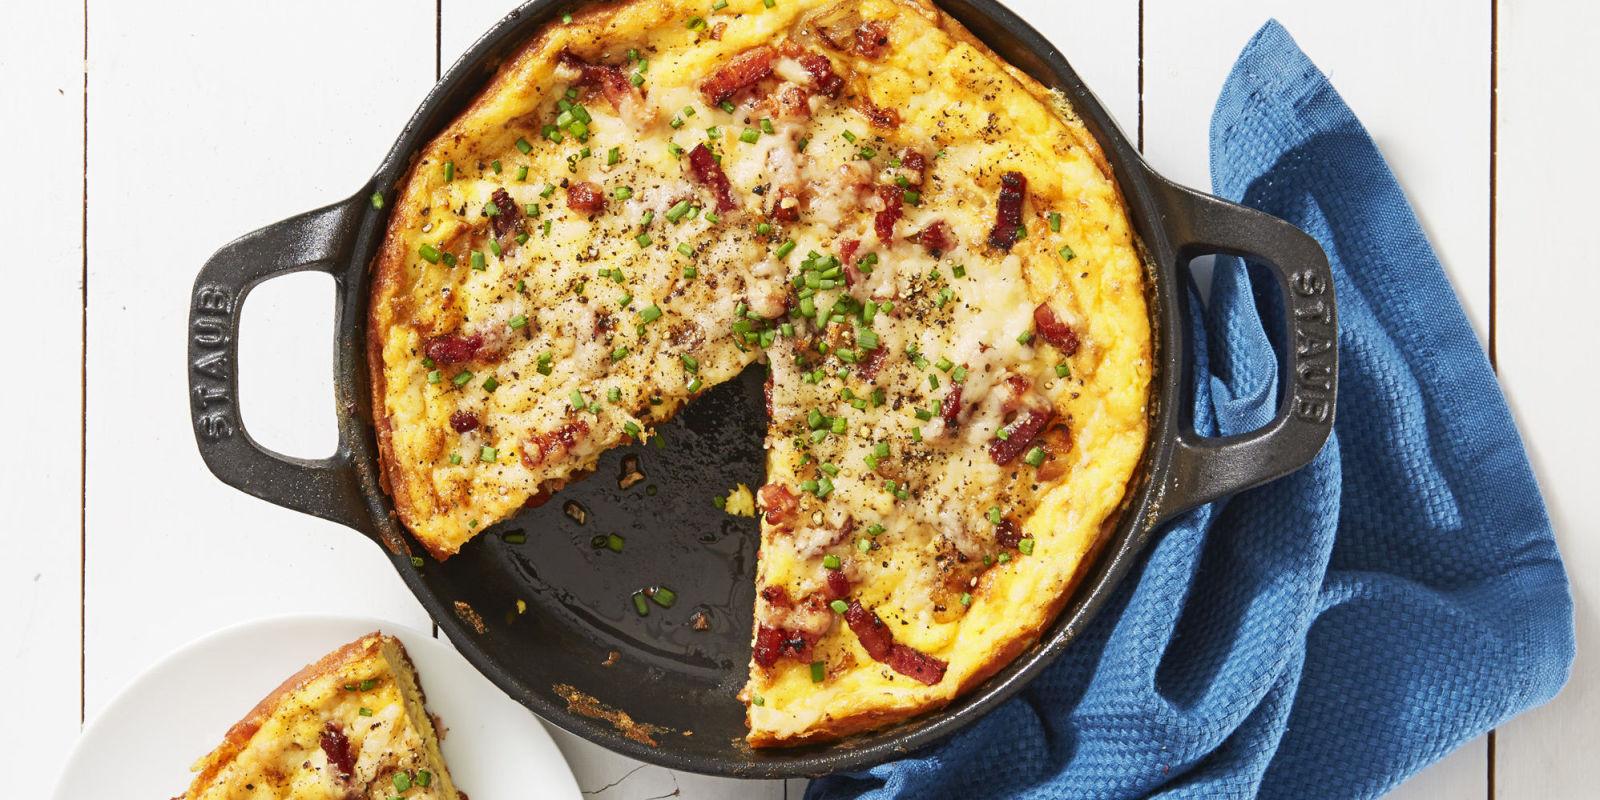 Best crustless quiche lorraine recipe for Good quiche recipes easy